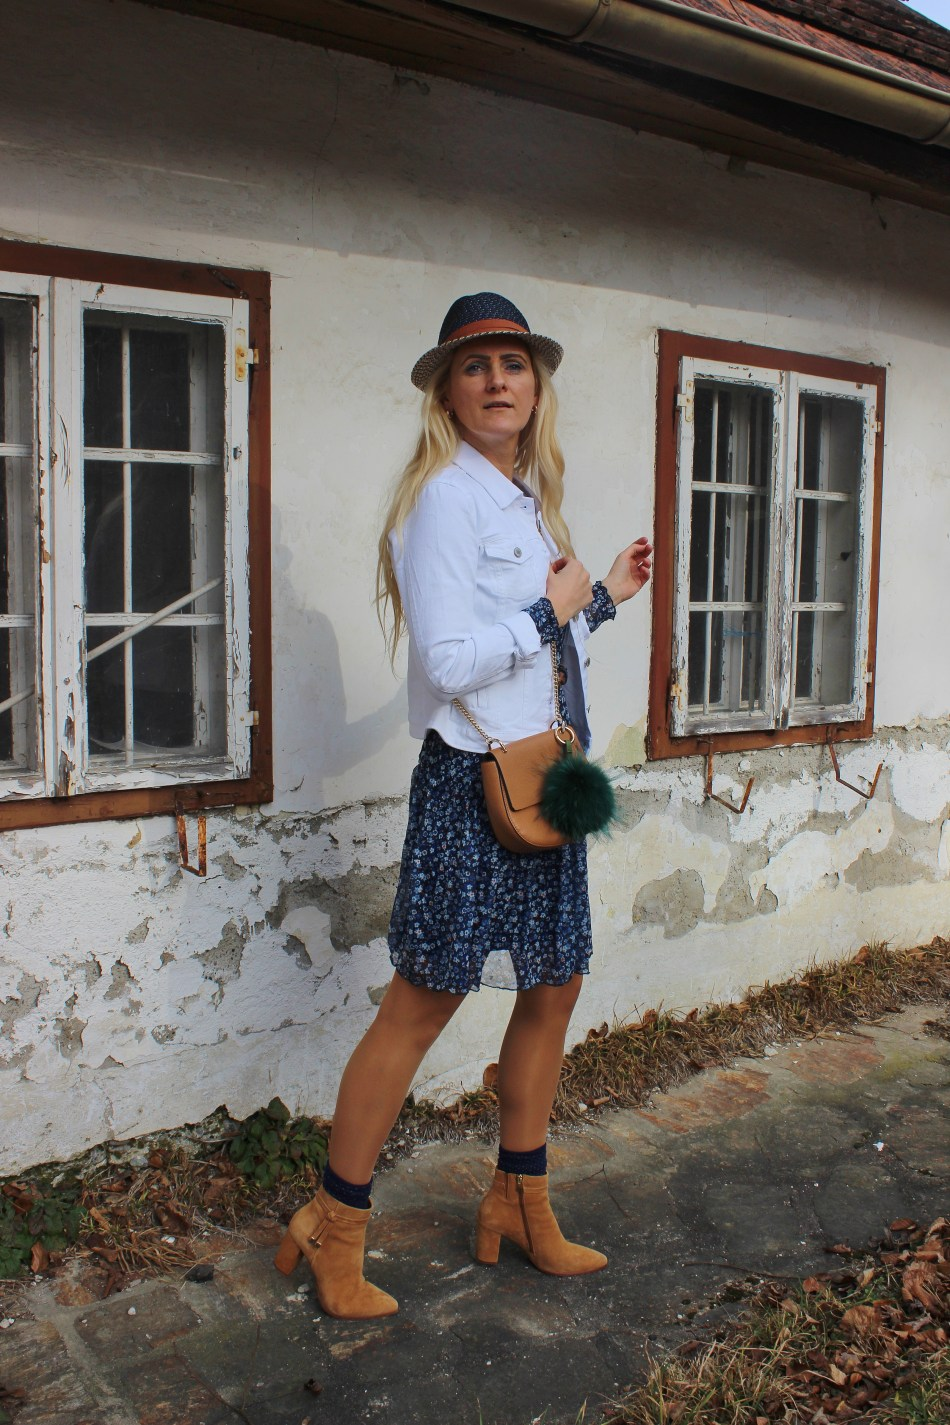 CCC-Shoes-and-Bags-Takko-Fashion-Floralprint-Dress-Denim-White-Jacket-Boots-carrieslifestyle-Tamara-Prutsch